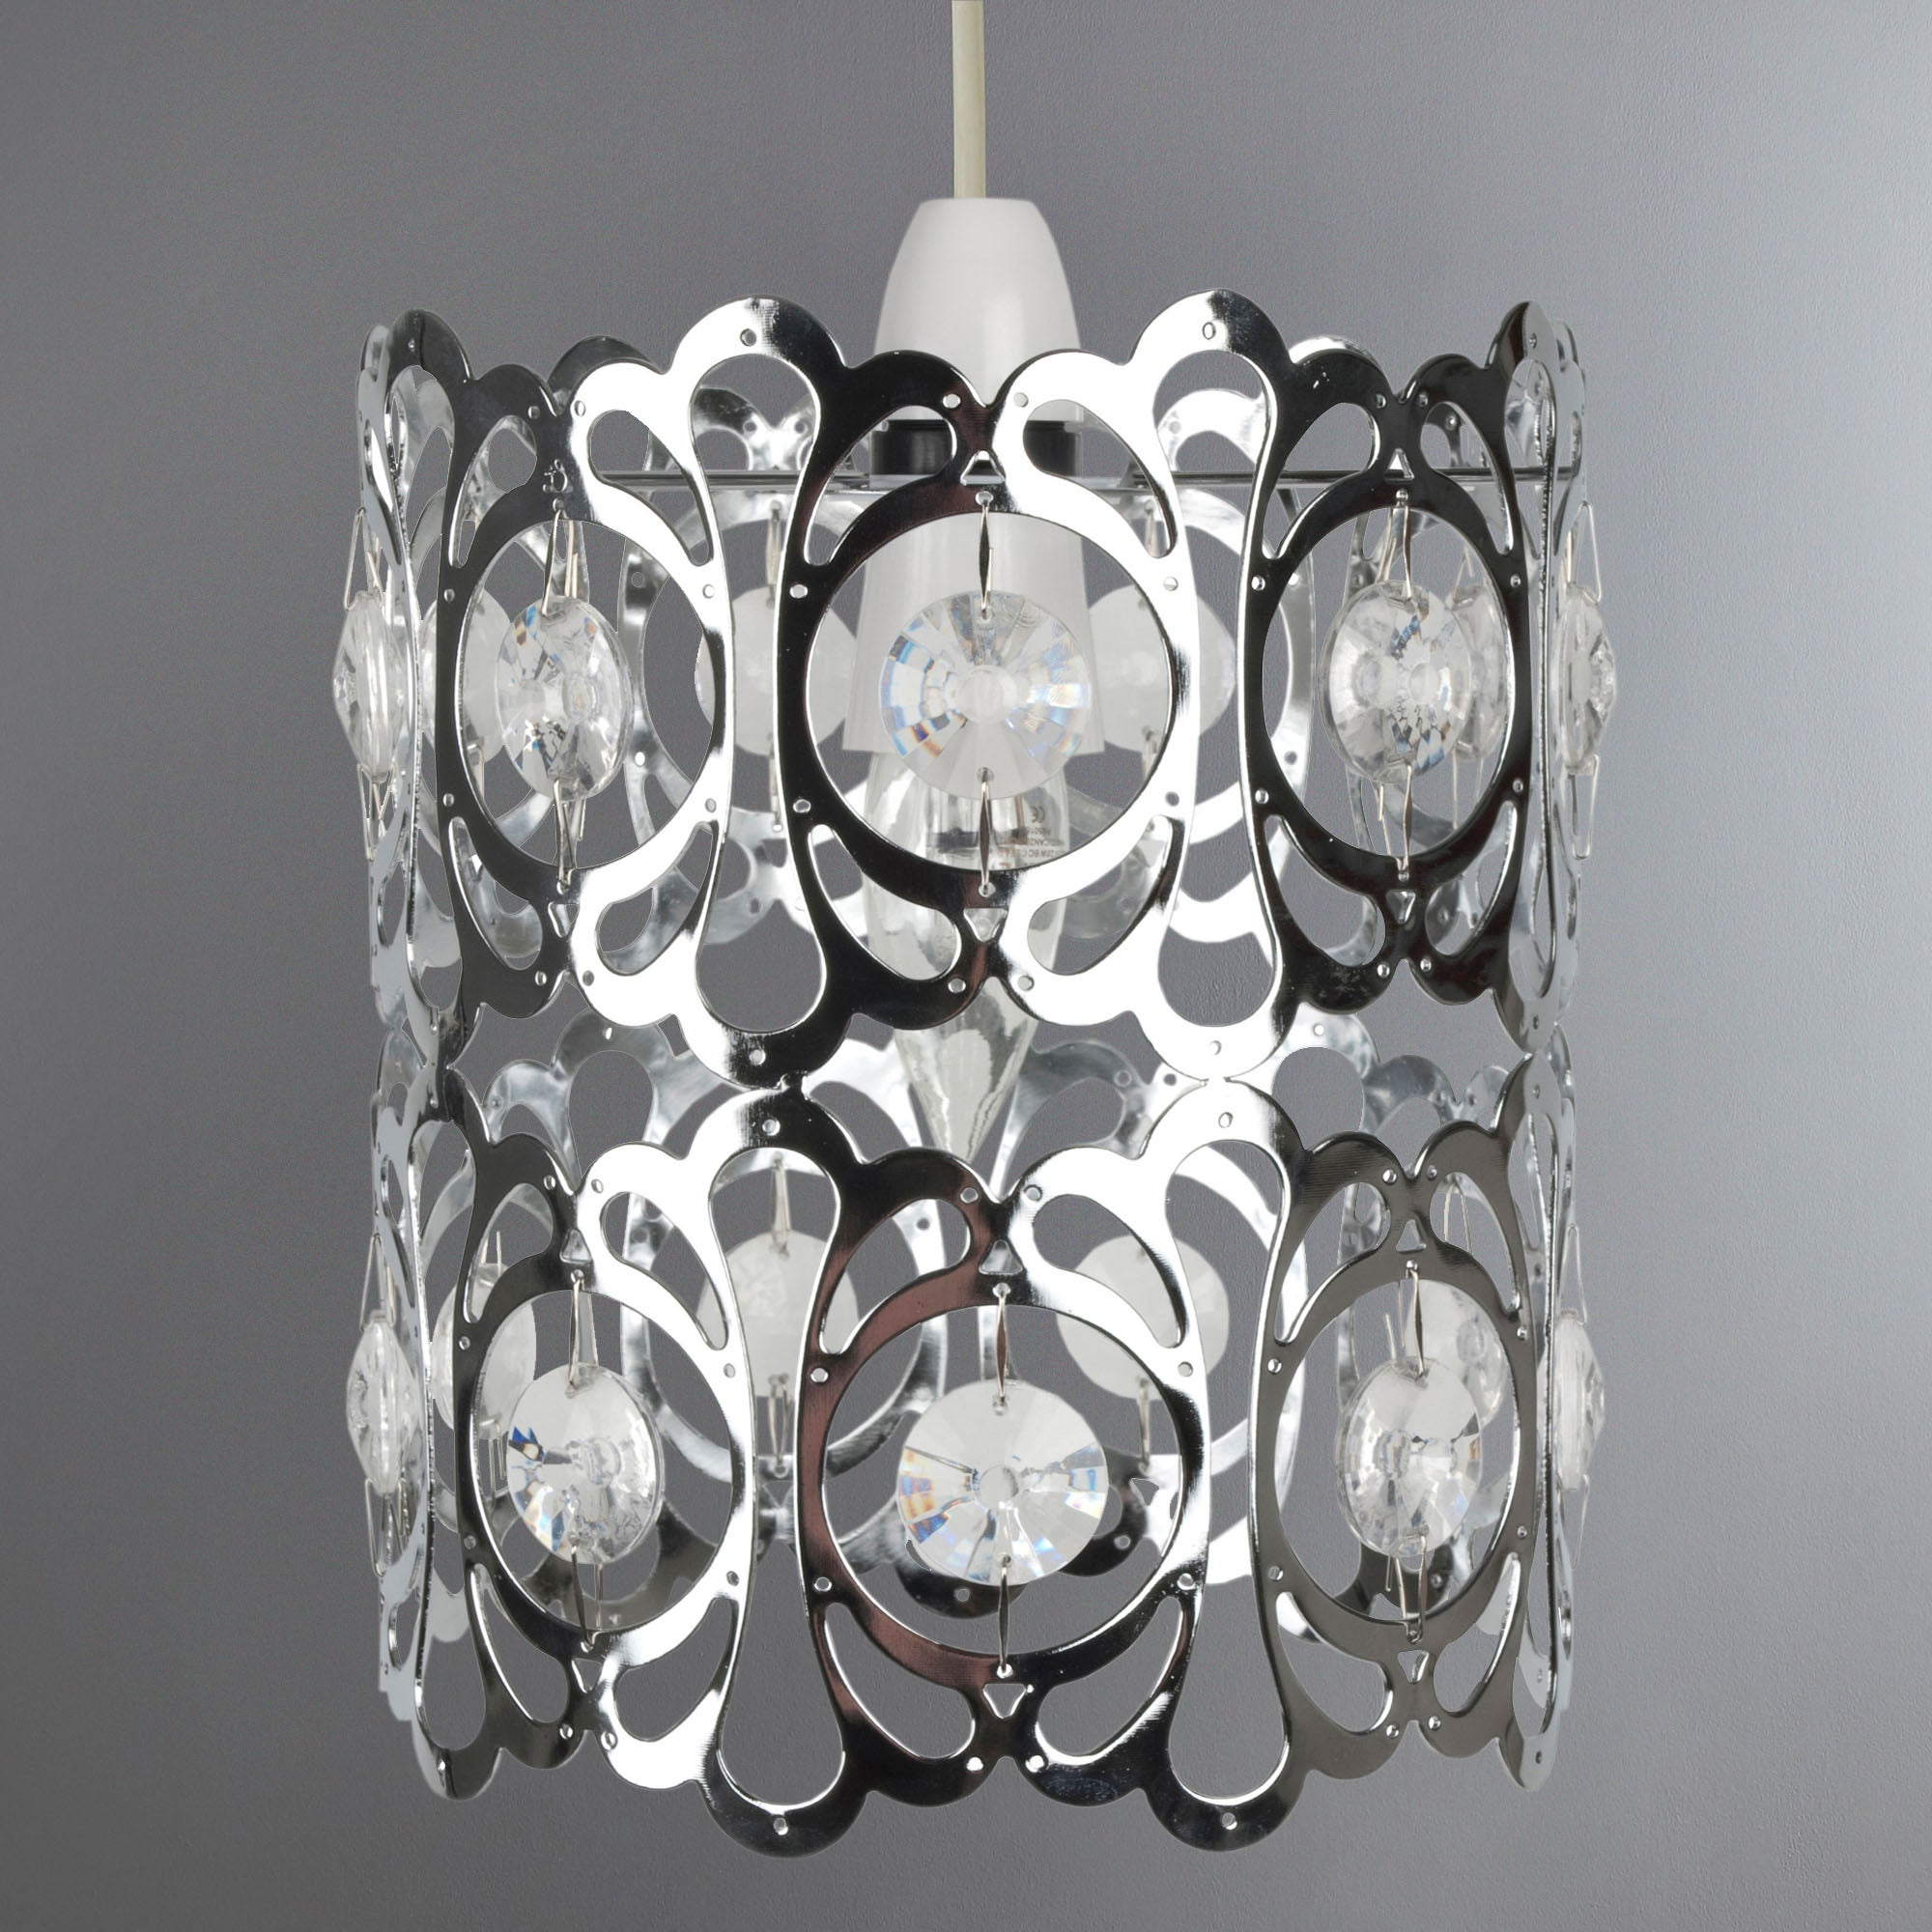 Jewel Cylinder Pendant Light Fitting